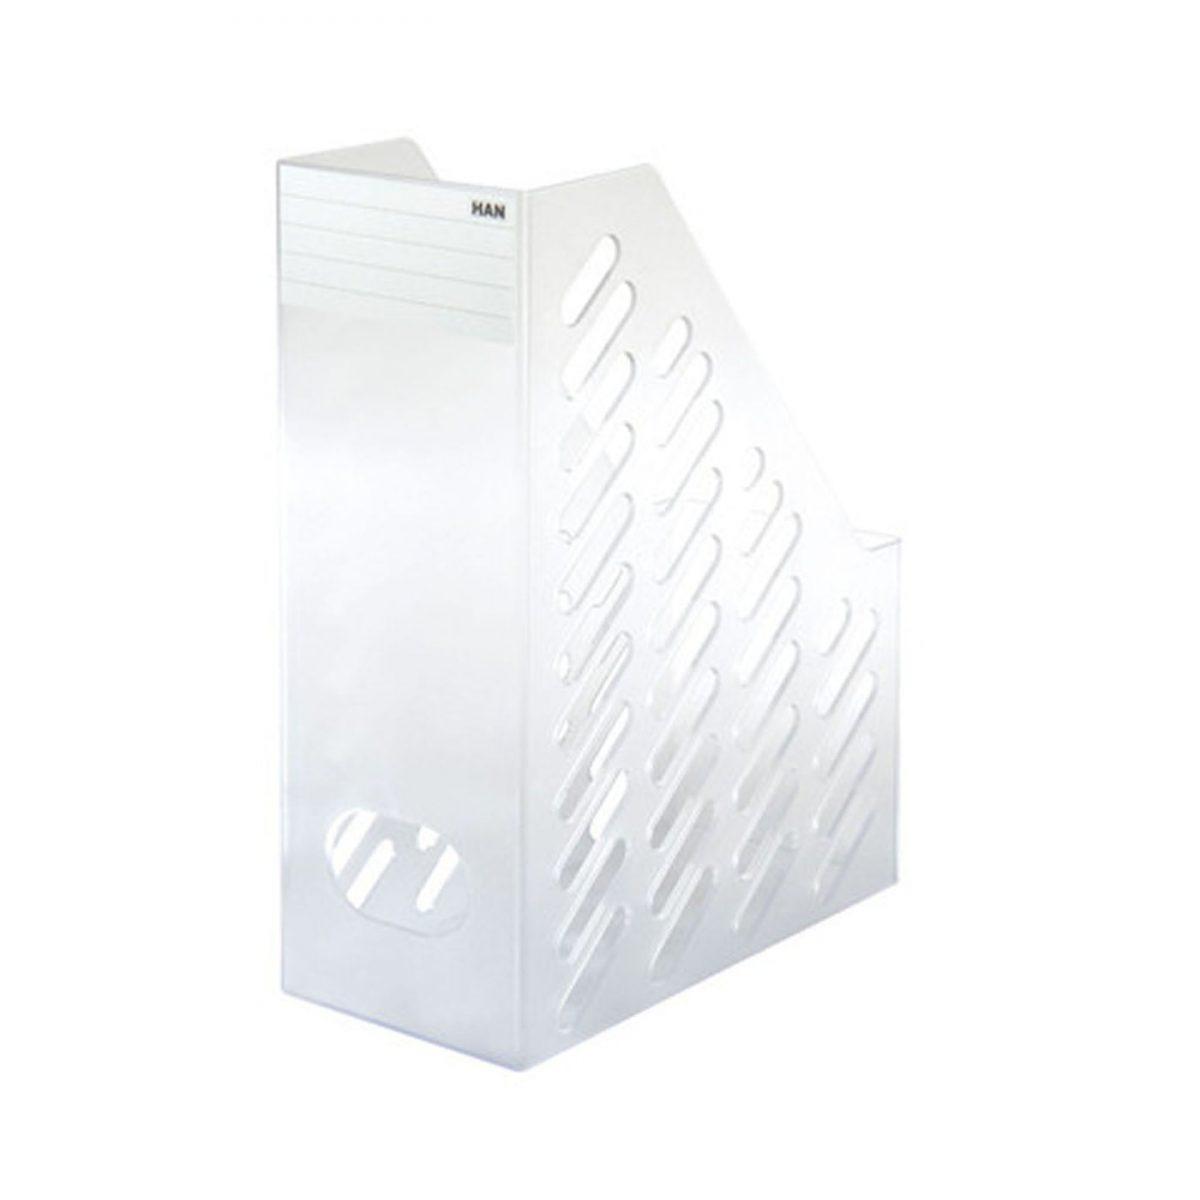 Suport vertical transparent pentru cataloage HAN Klassik XXL